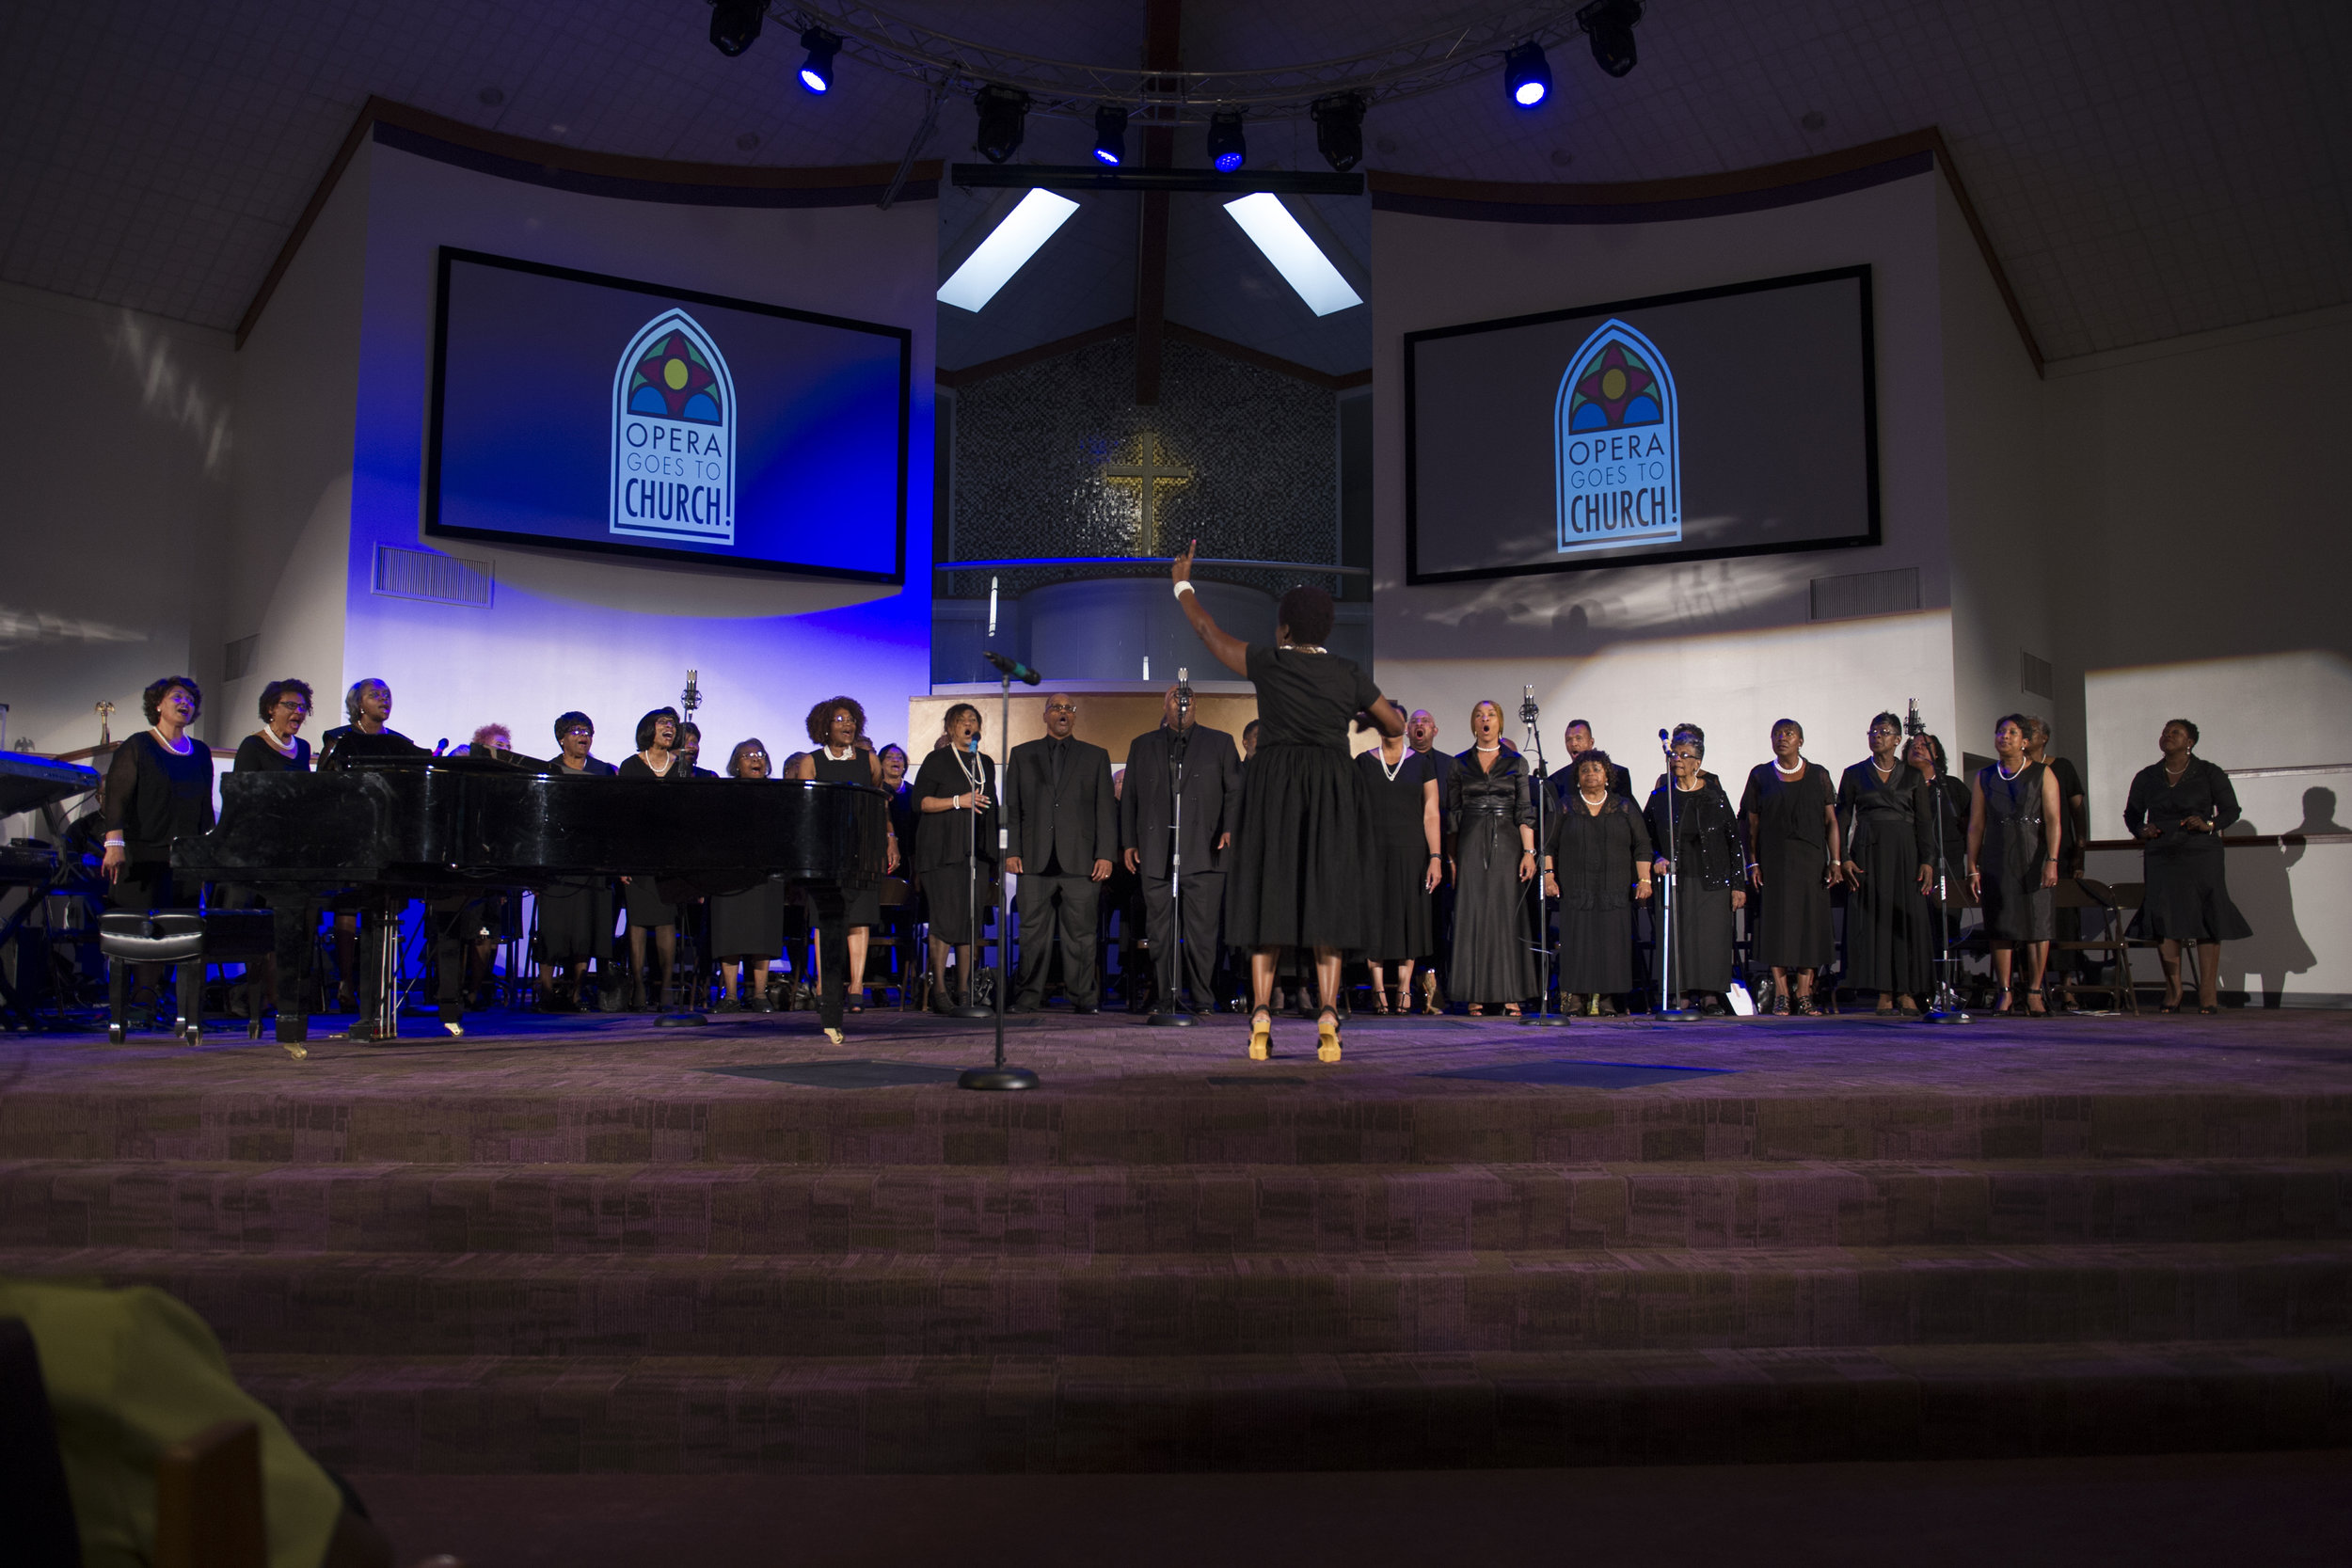 OG2C-Lincoln Heights-Choir-7-20-2016 (14).jpg